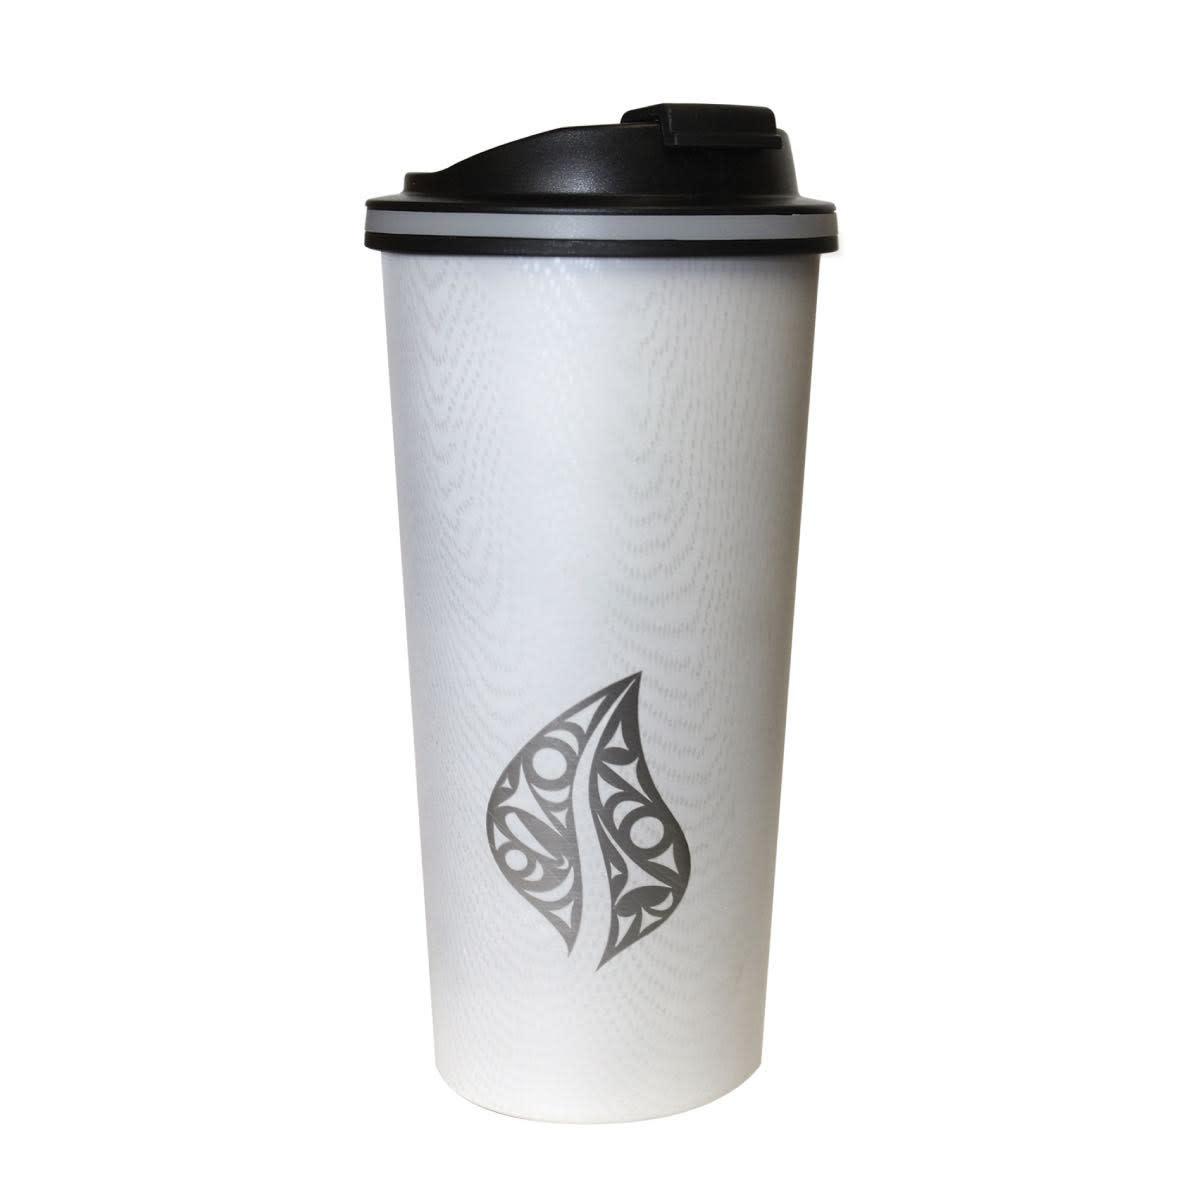 Travel Mug- Wood Grain style.-3